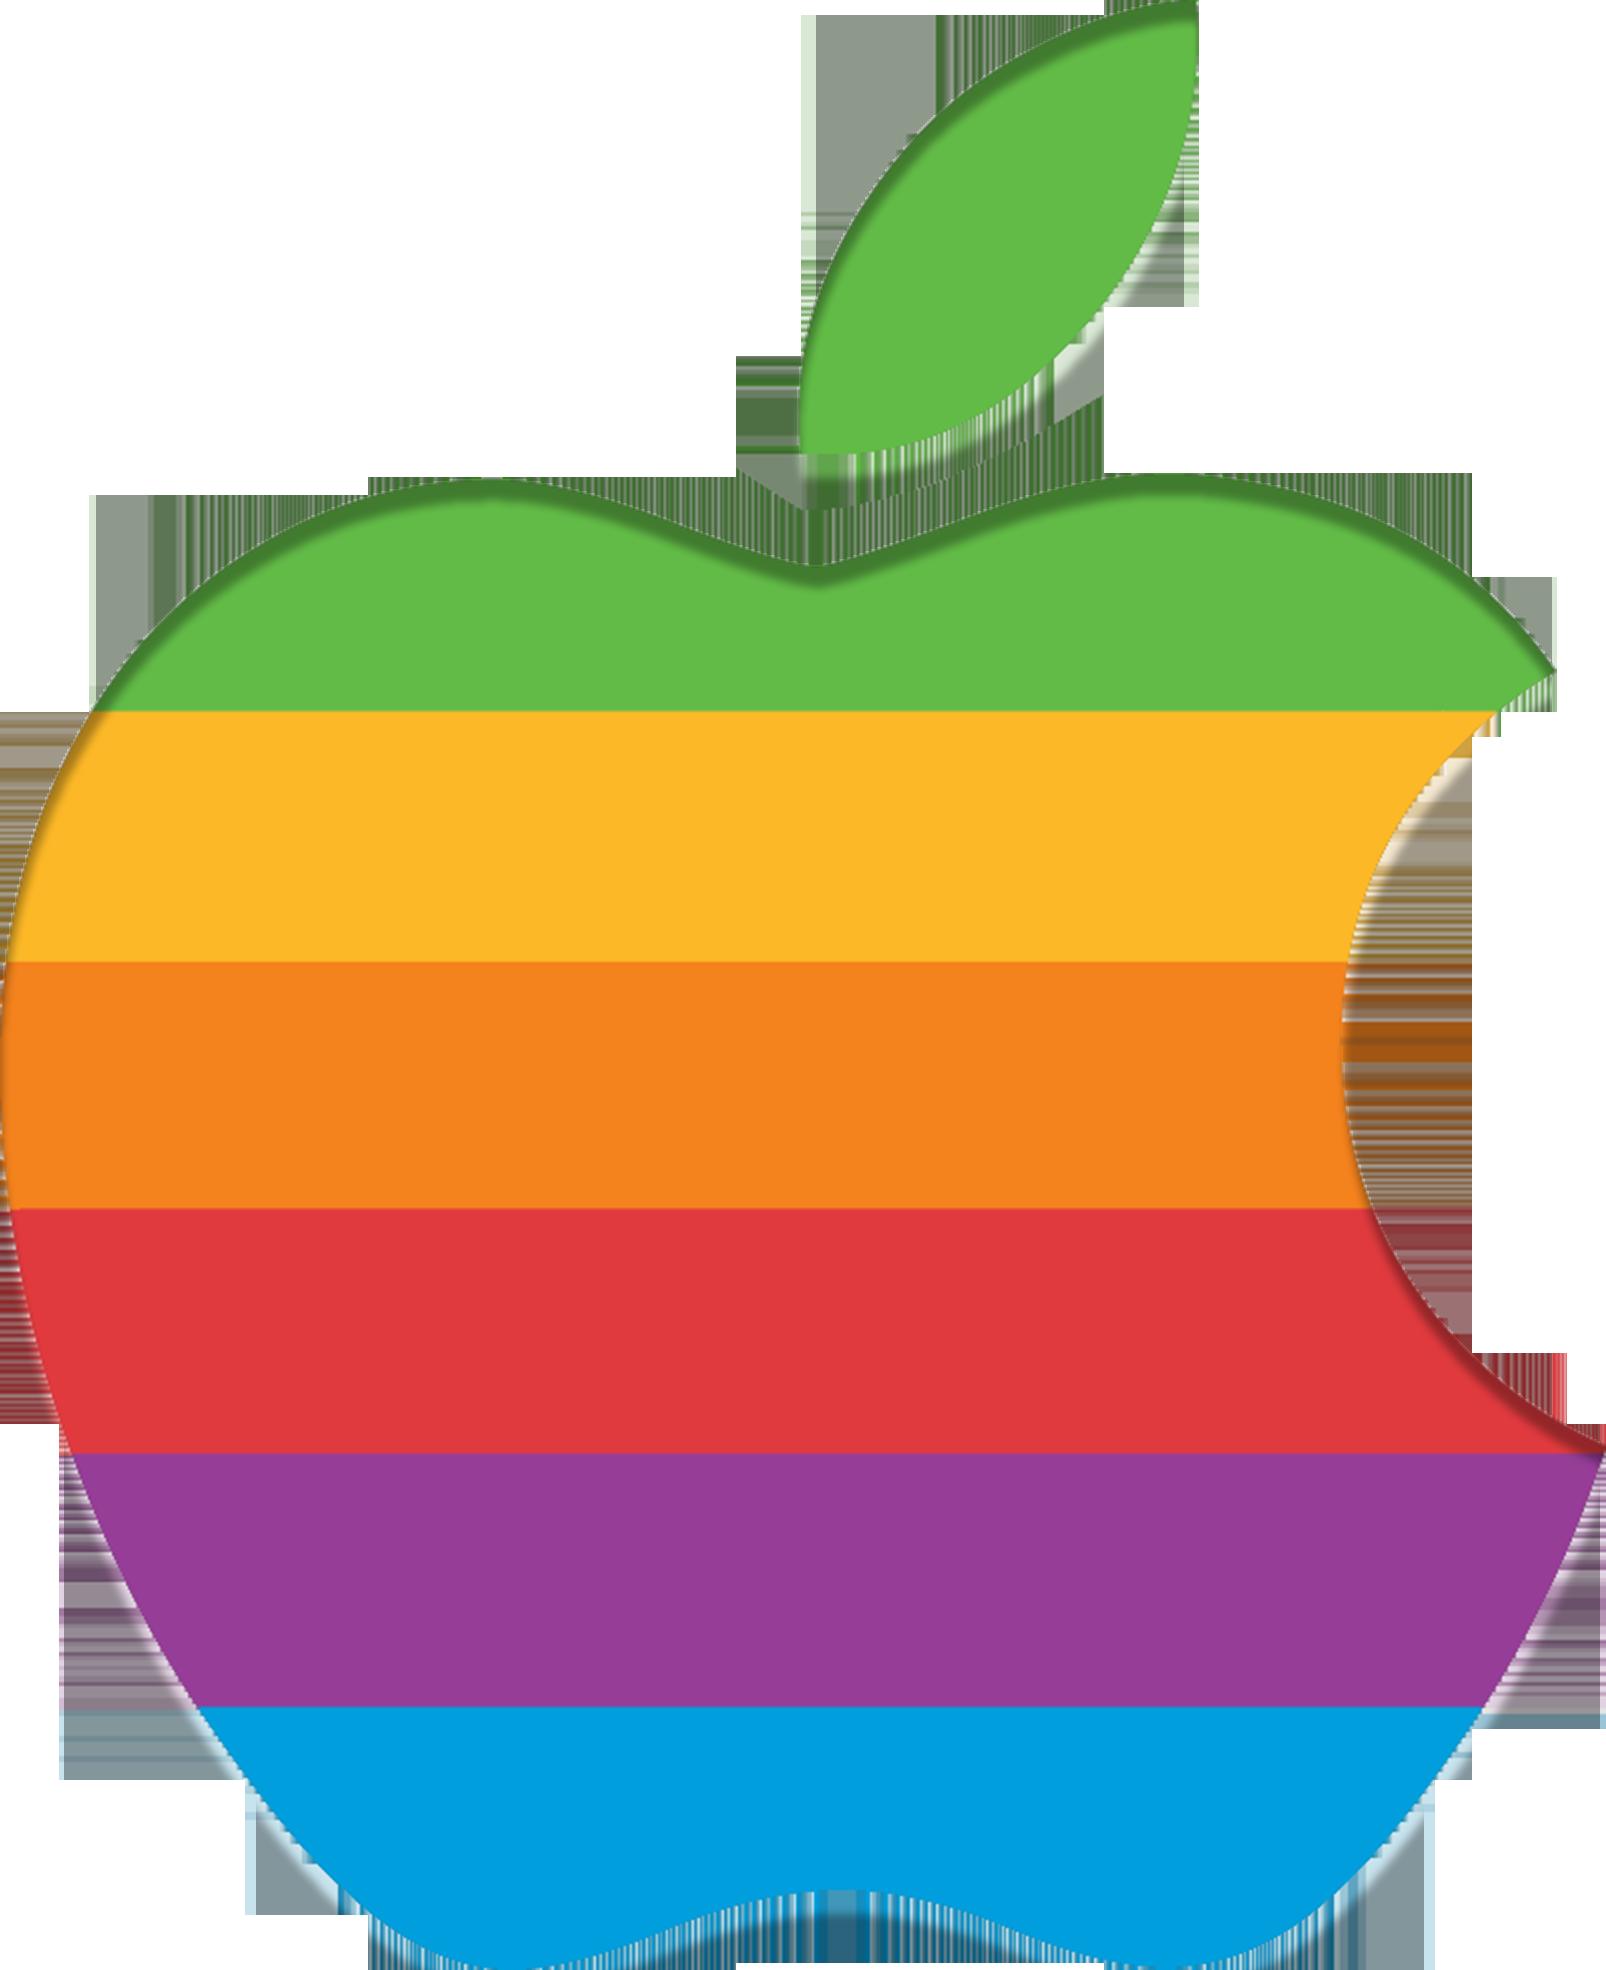 Image - 15-black-apple-logo-transparent-background-free ...